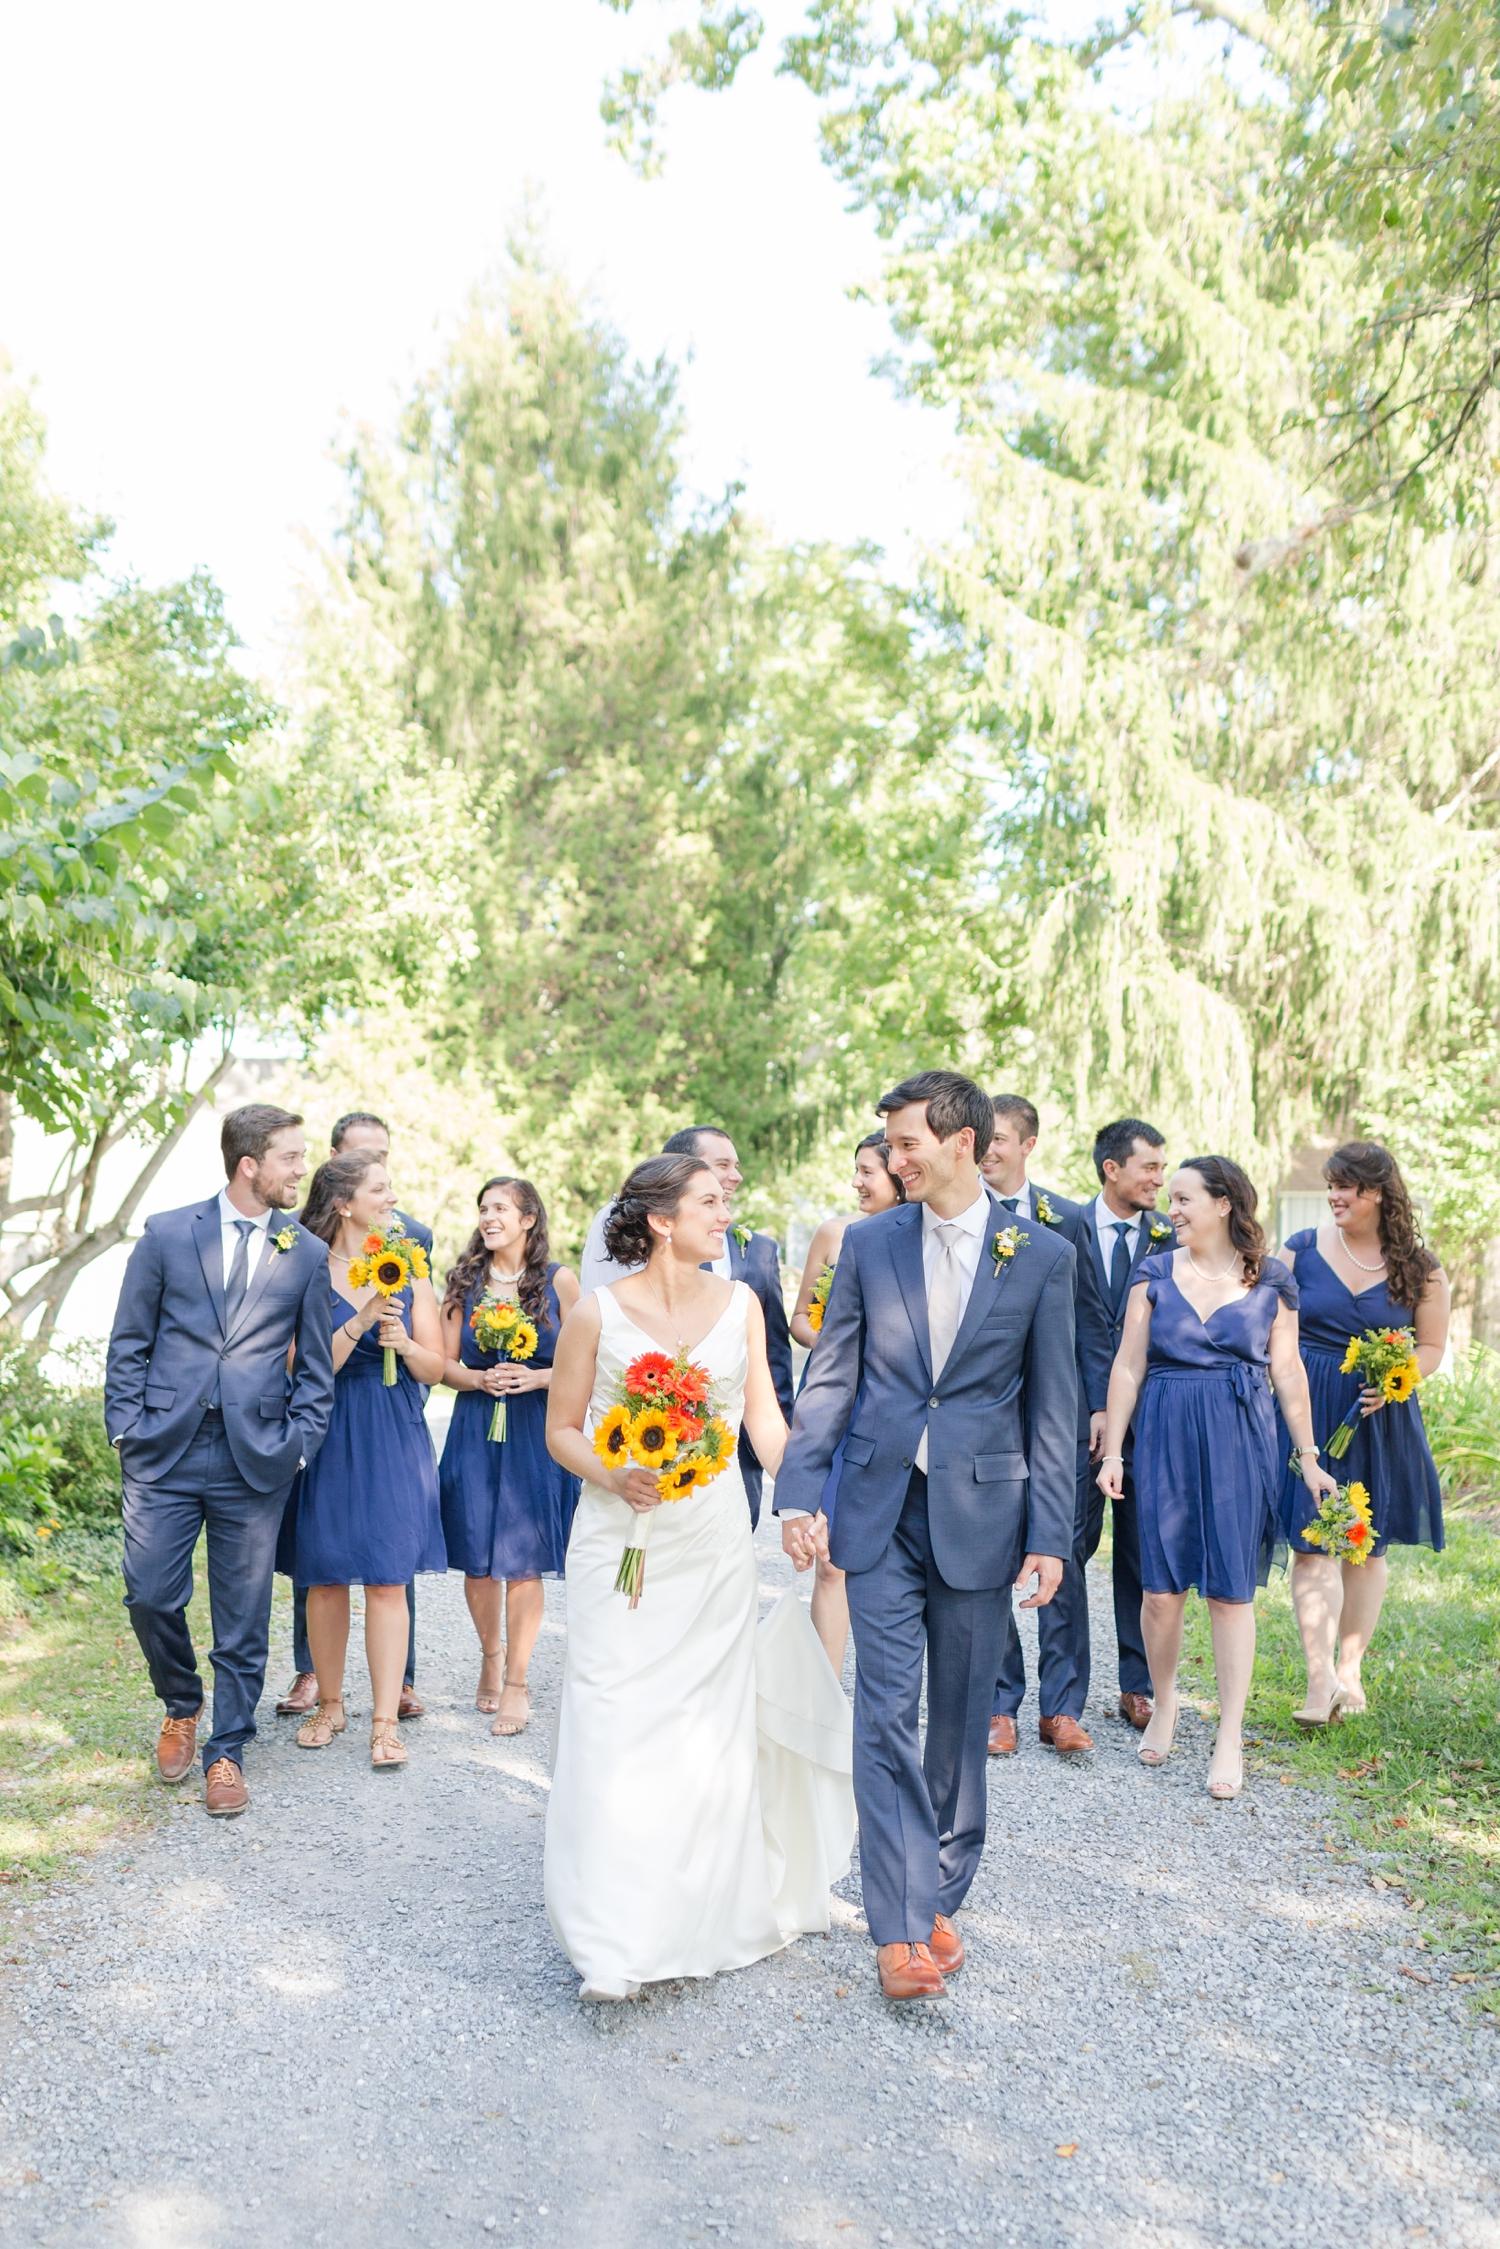 Wang Wedding 4-Bridal Party-382_maryland-and-virginia-wedding-photographer-anna-grace-photography-photo.jpg